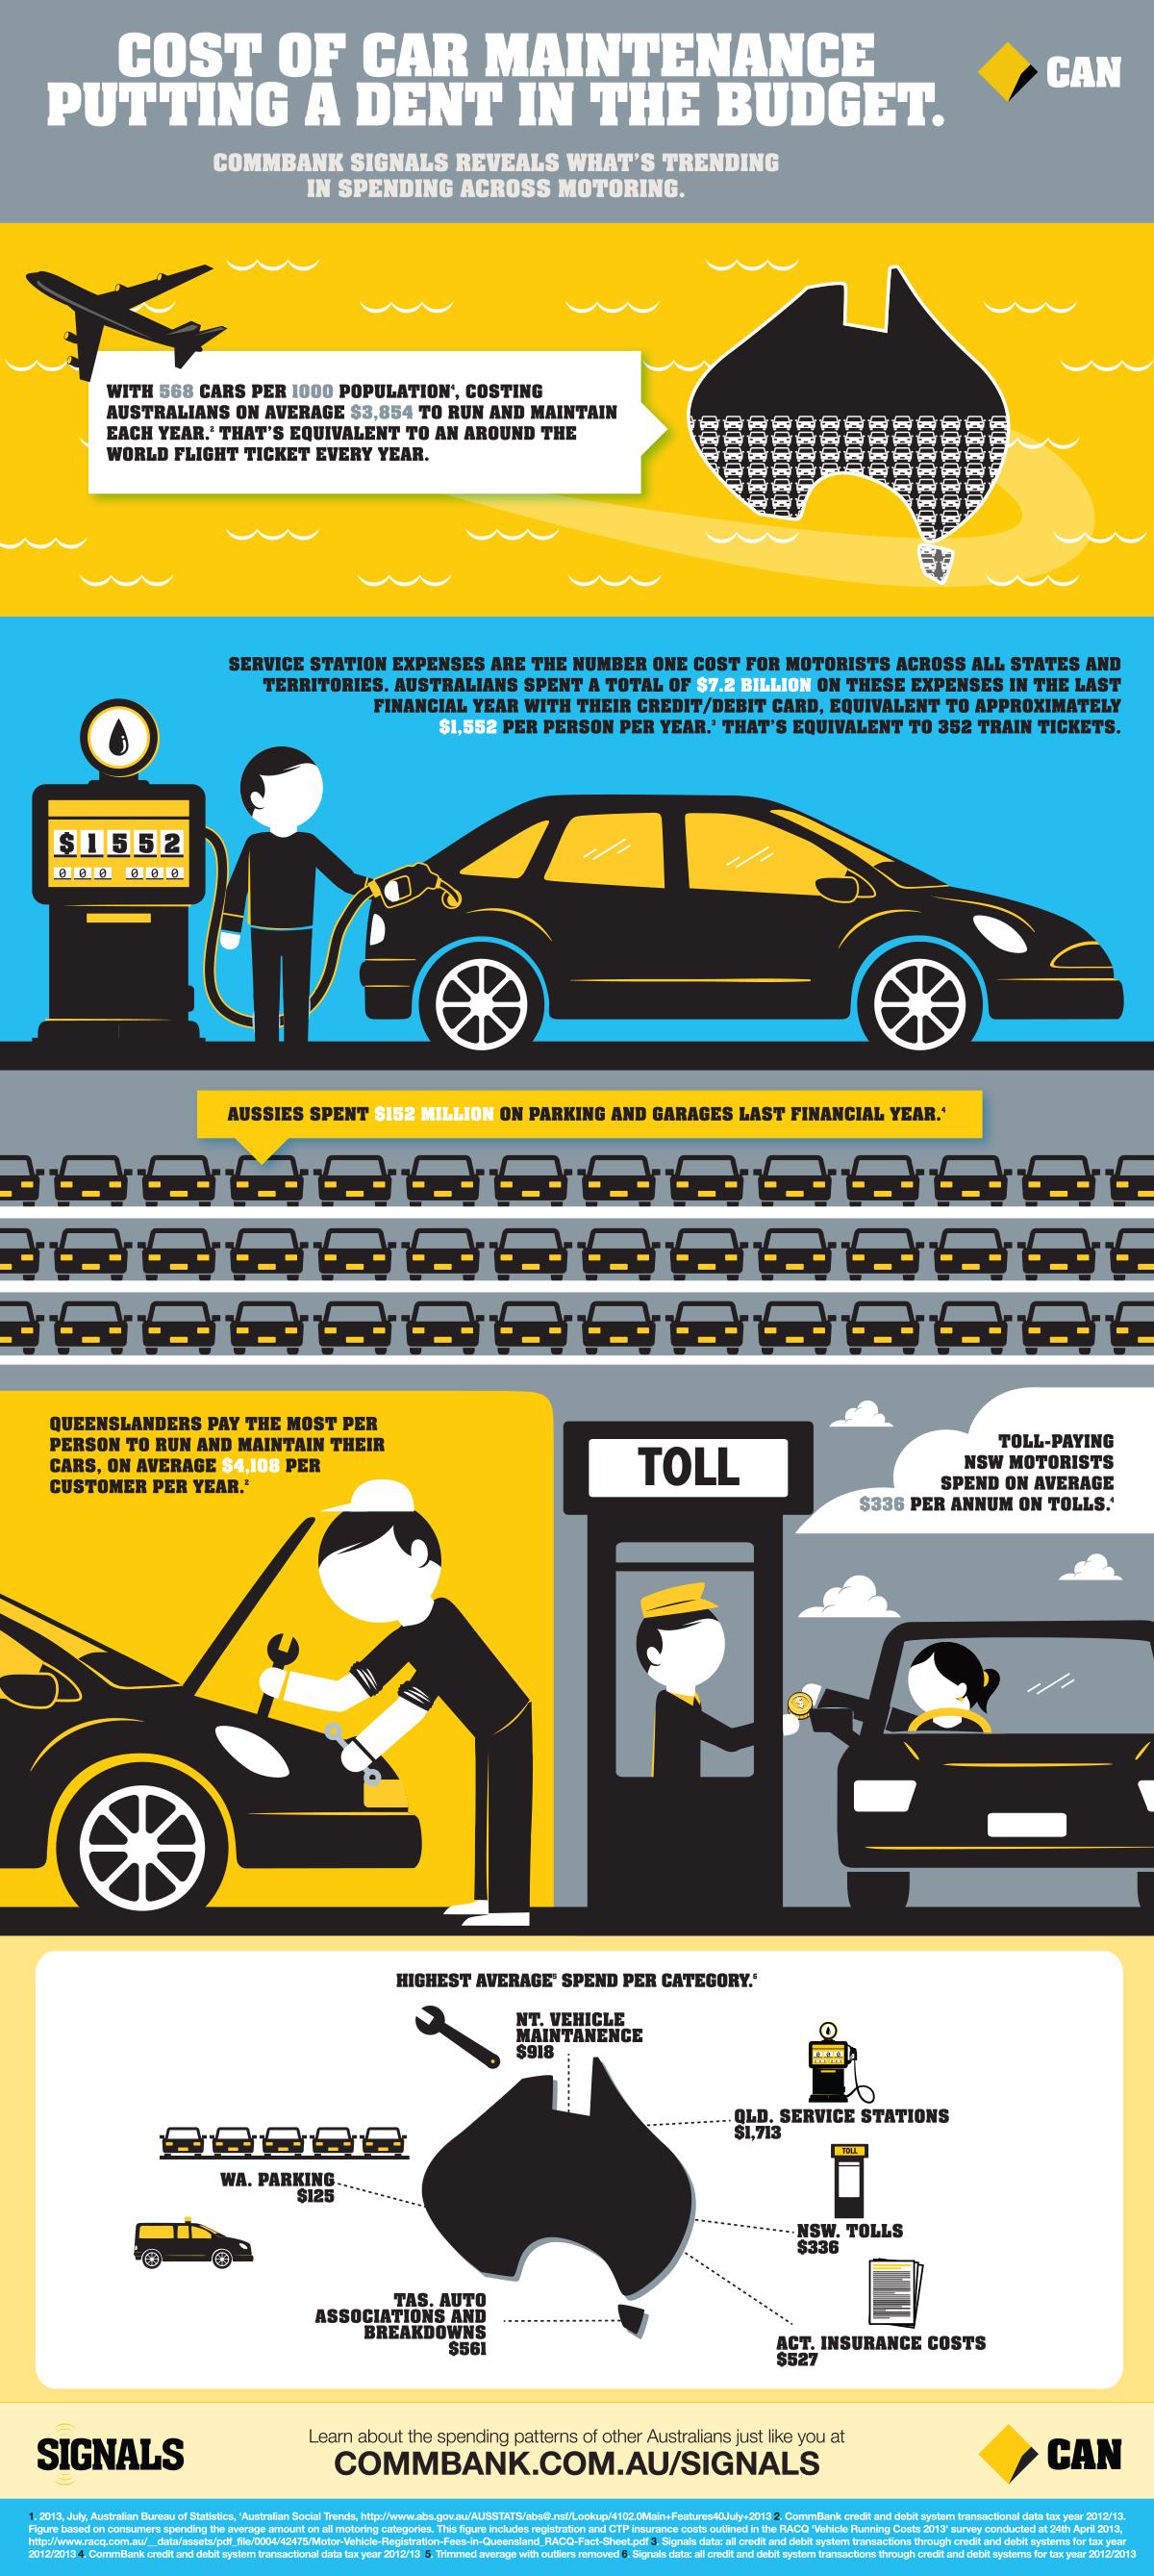 Cost of car maintenance